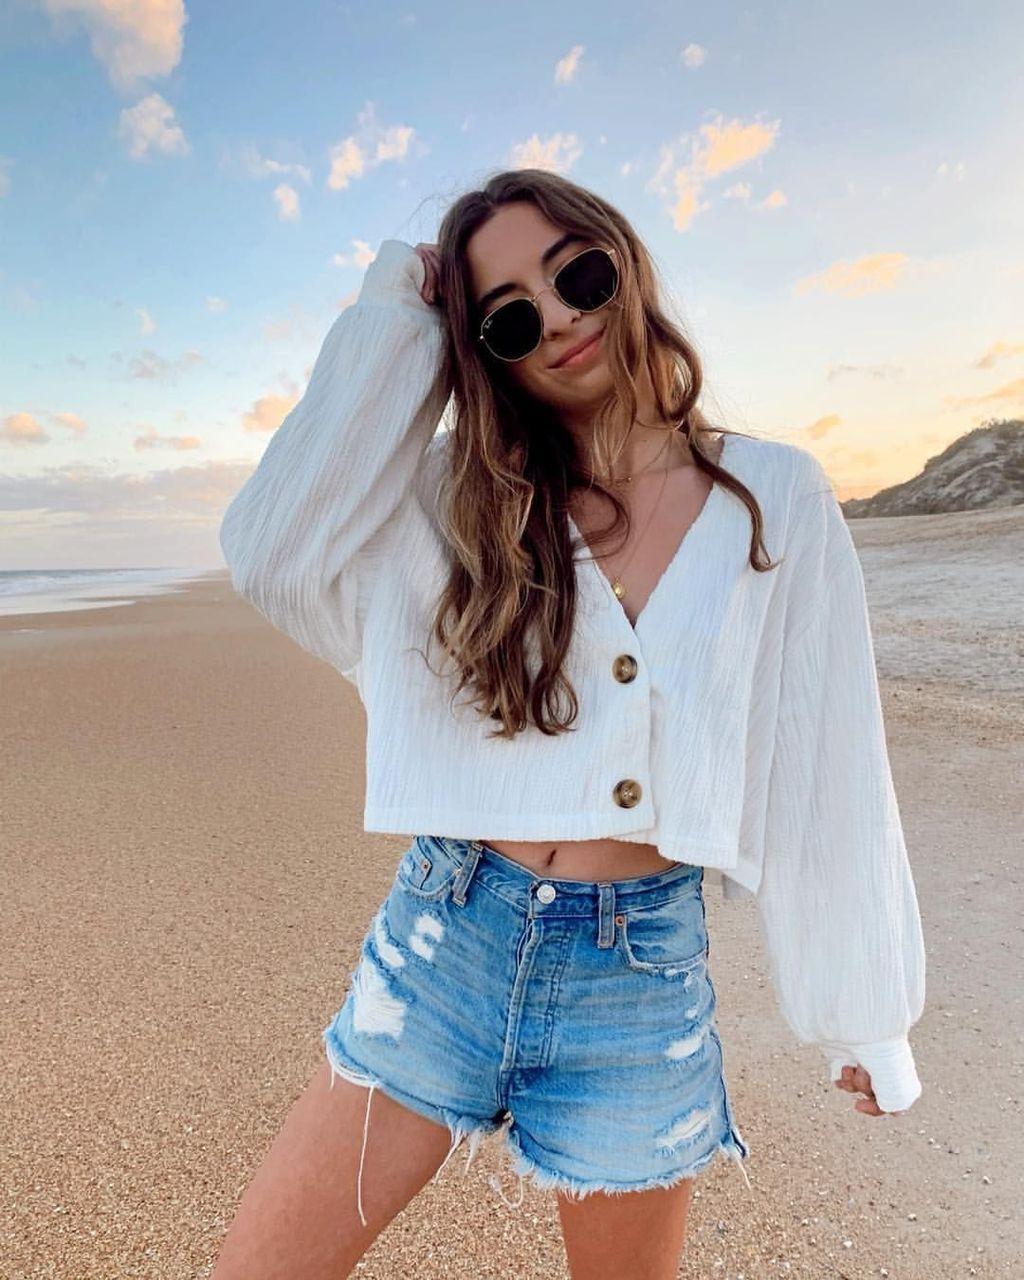 35 Newest Summer Beach Outfits Ideas For Women 2019